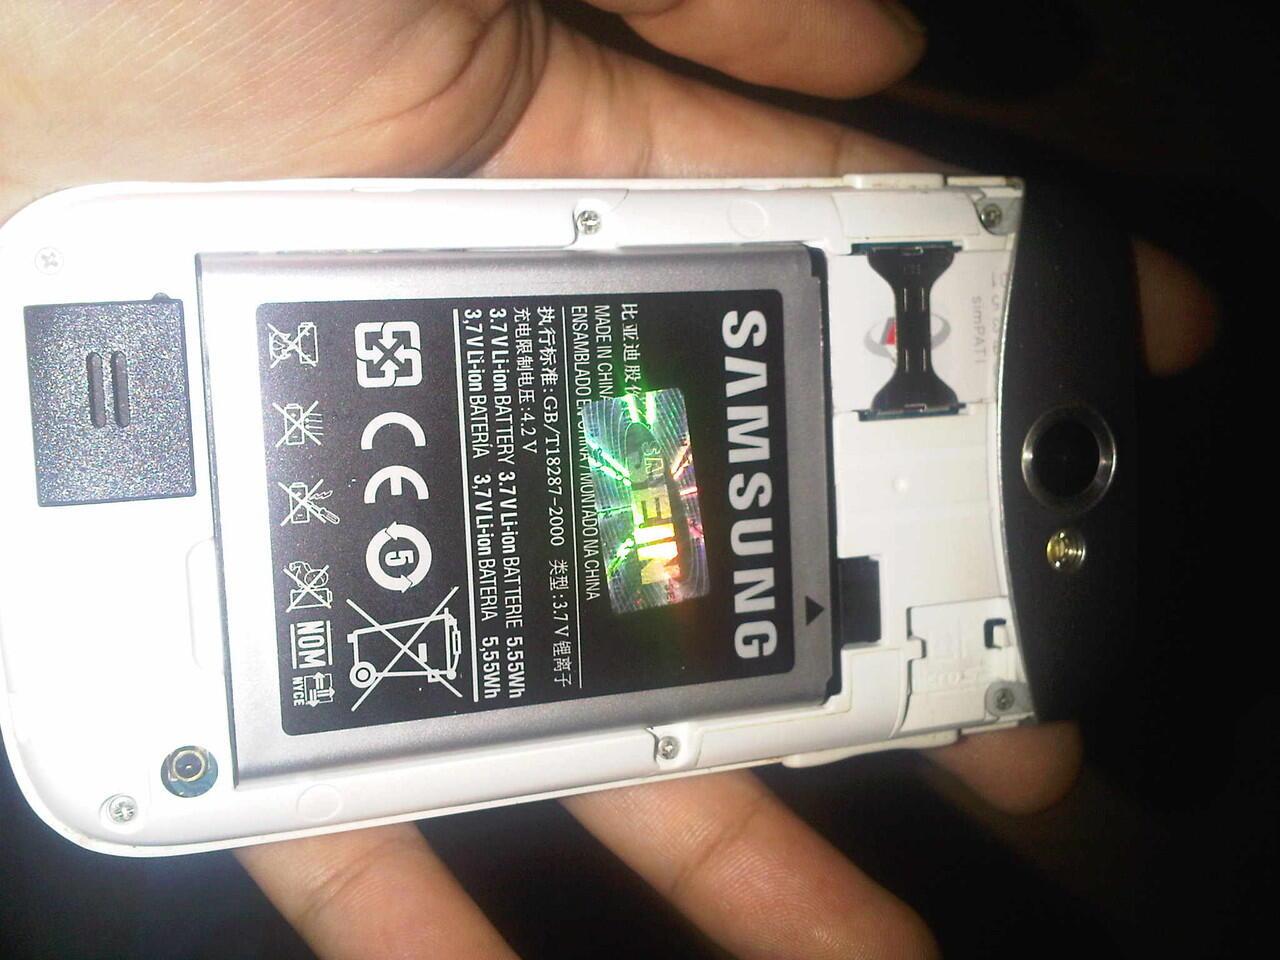 Samsung Galaxy W (wonder) White Gt-i8150